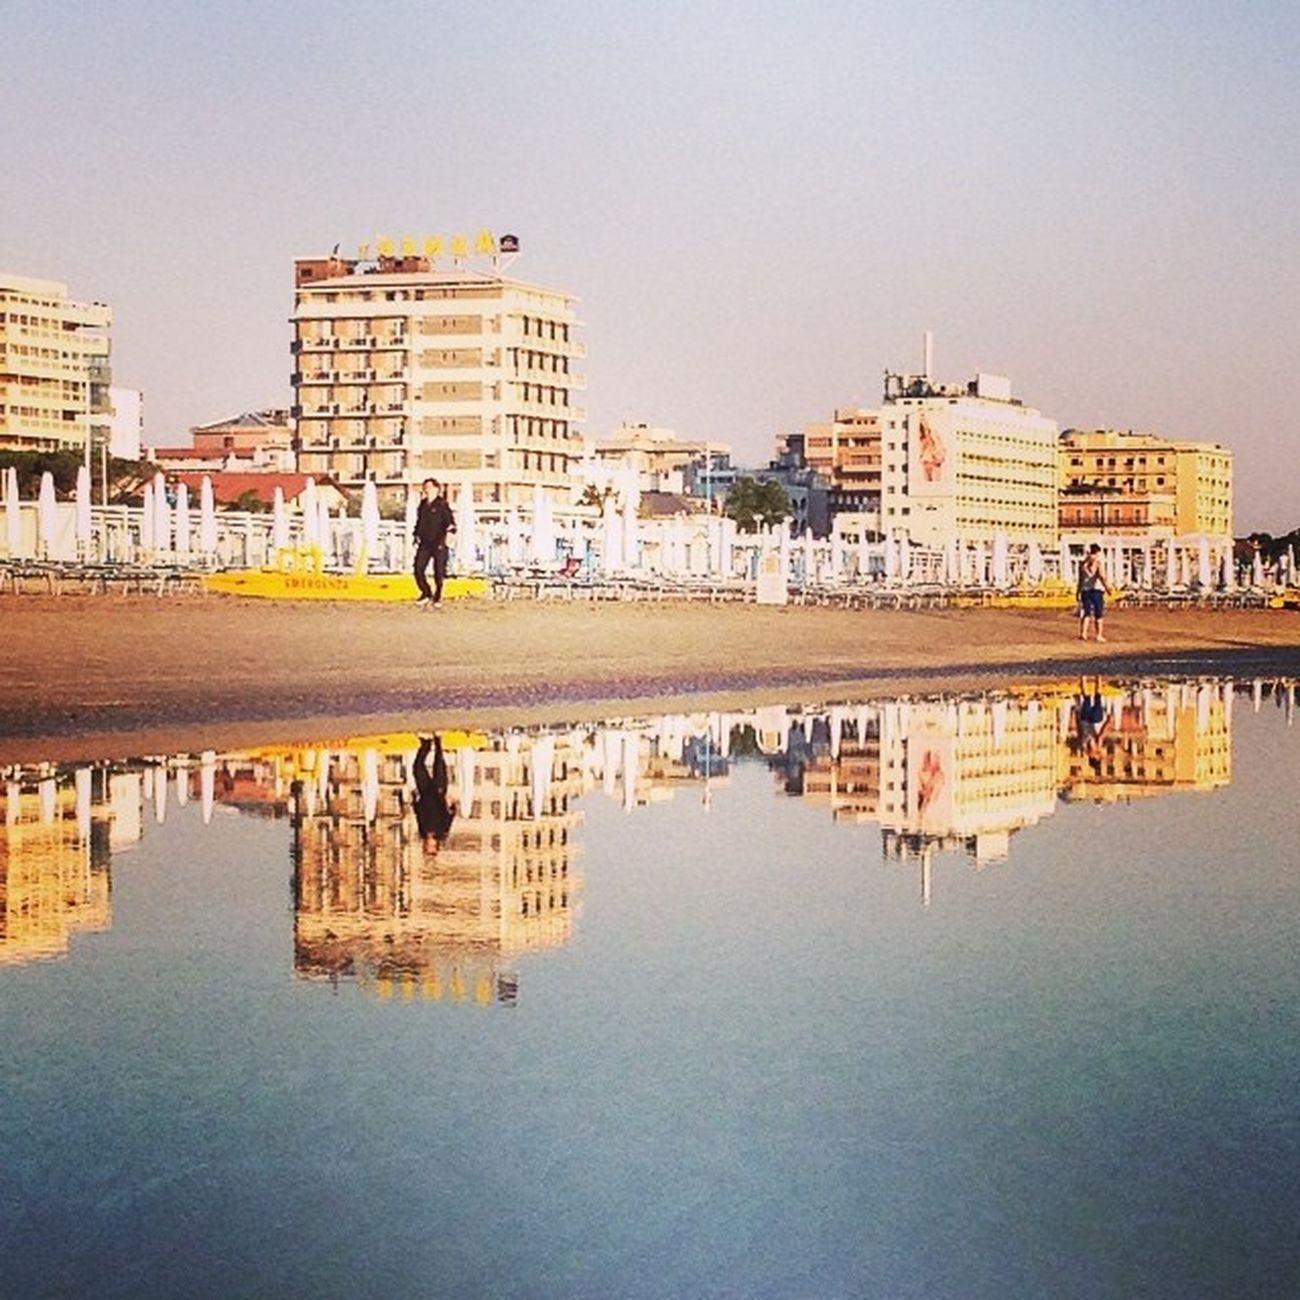 Riccione|enoicciR #riccione #alba #beach #summer #italy #webstapick #meshpics #lifeisbeautiful #lifelessordinary